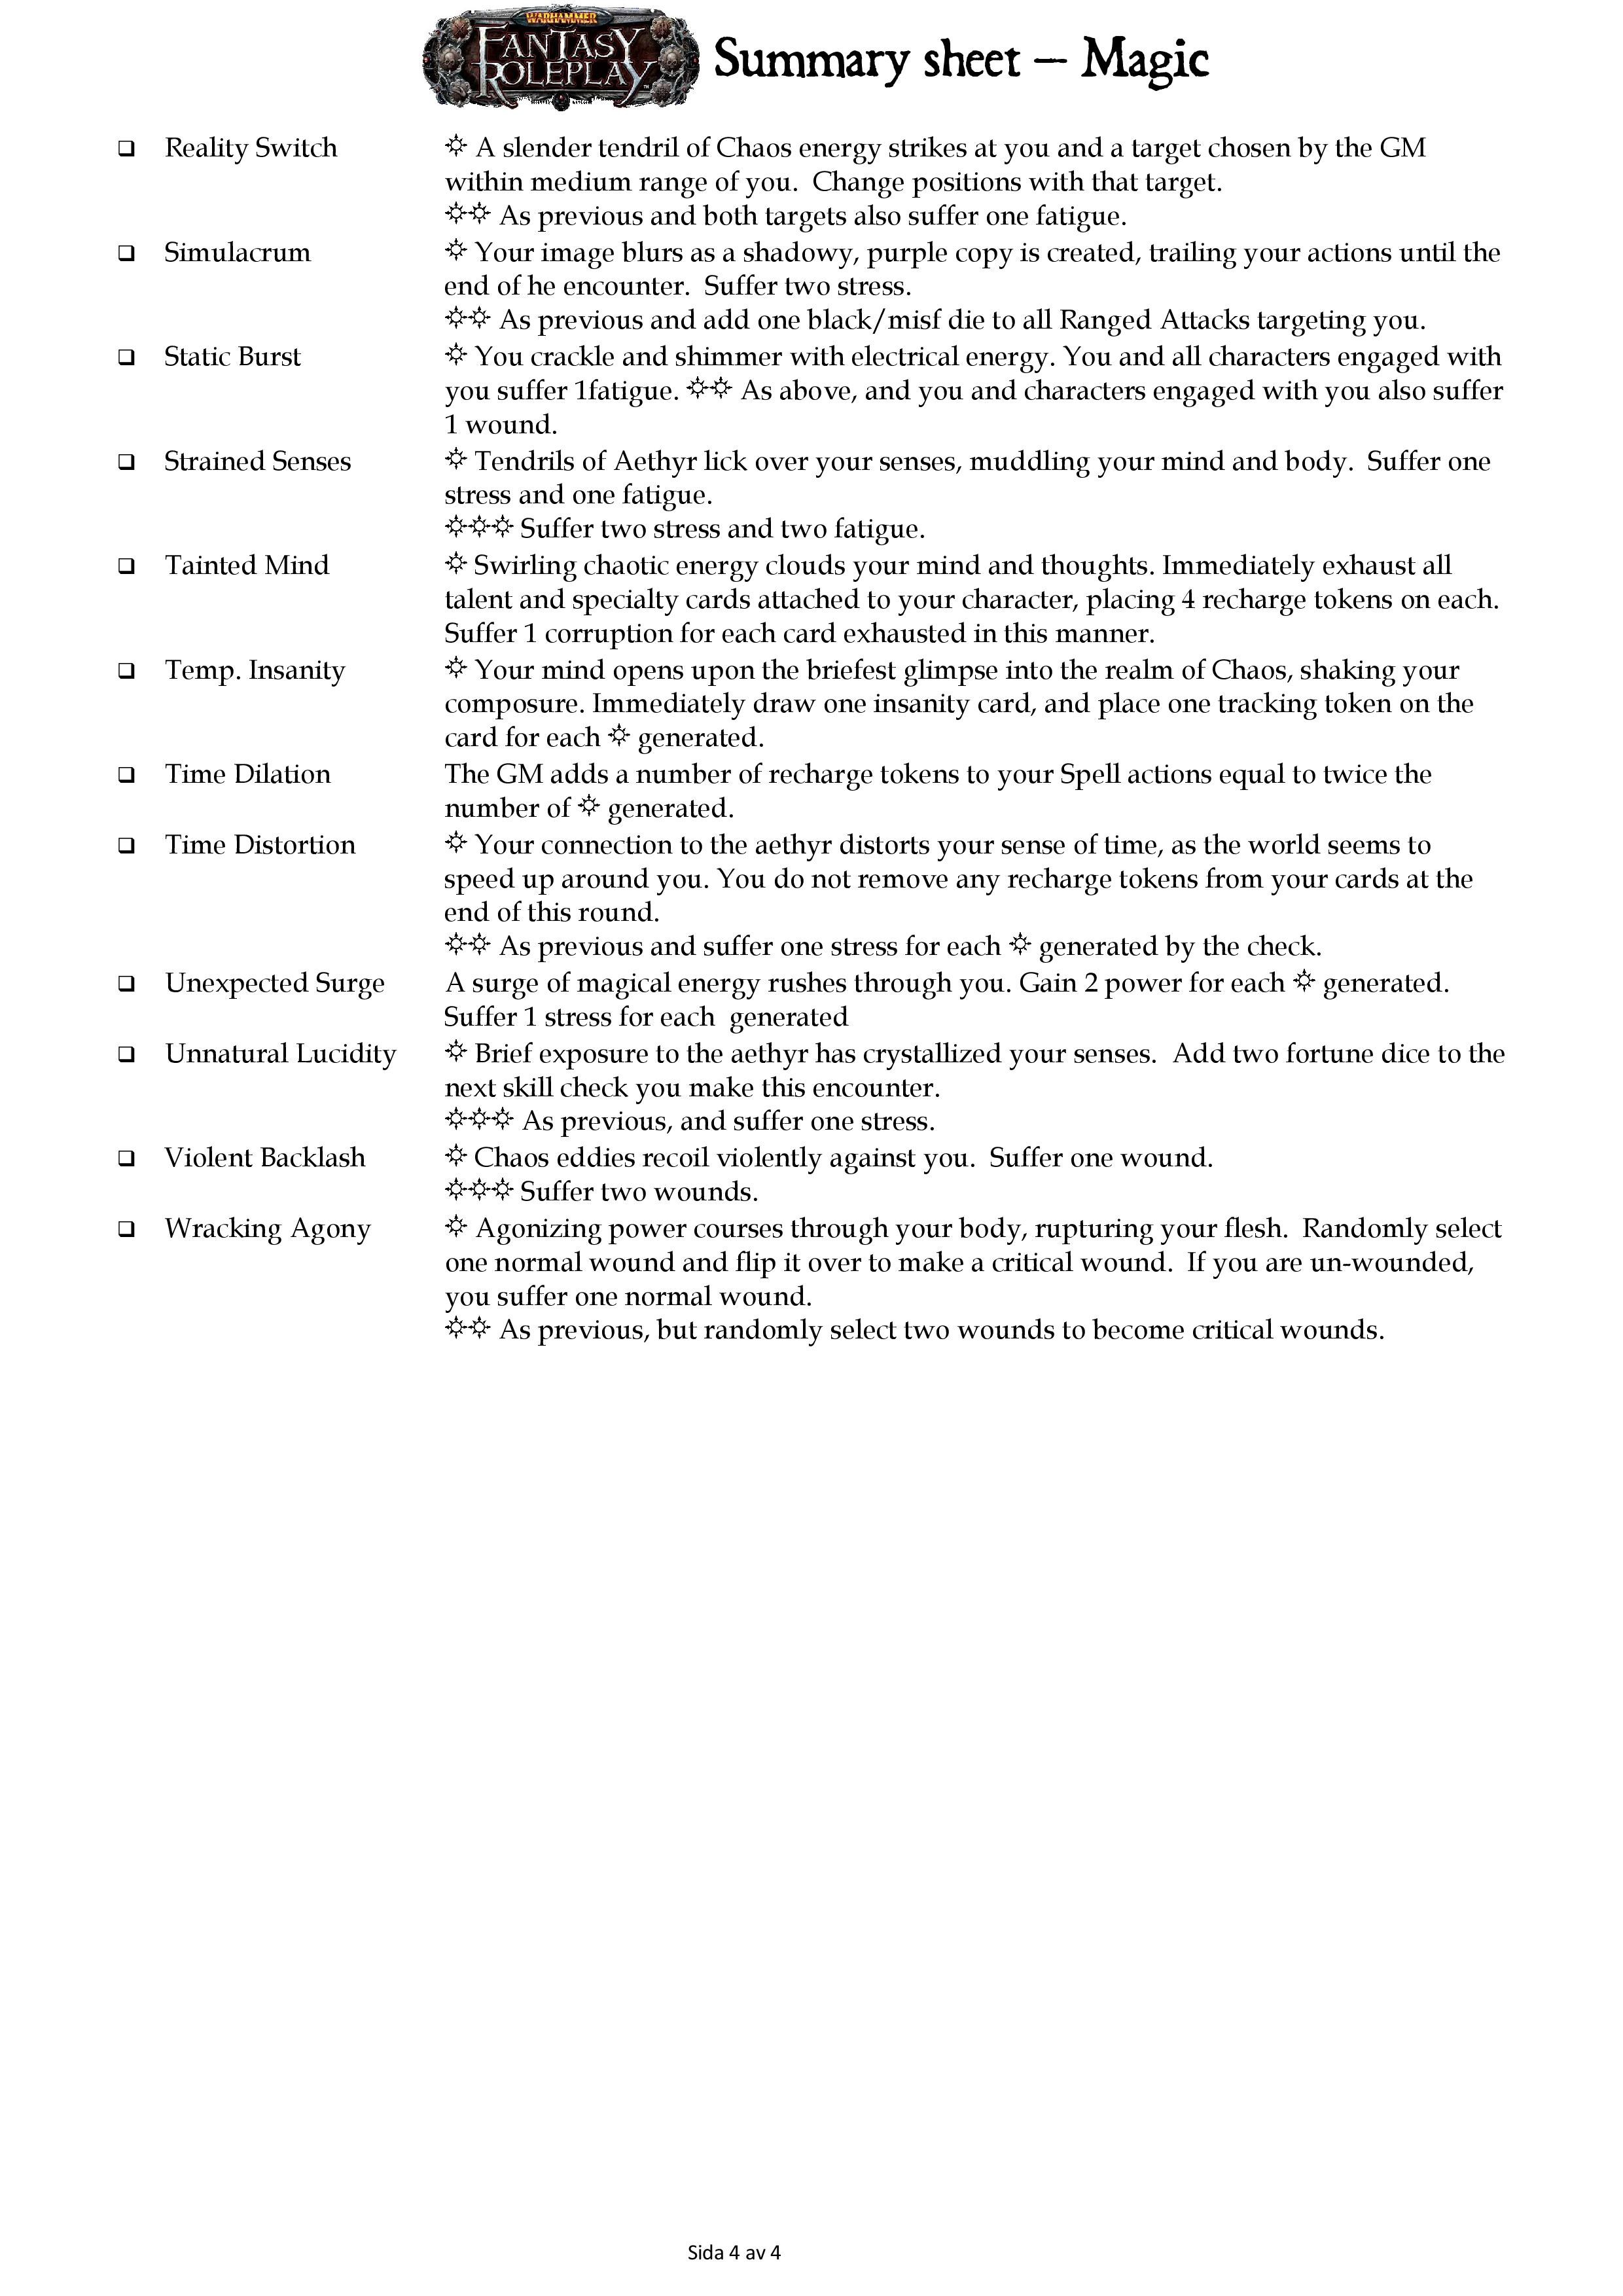 WFRP_3ed_Summary_Sheet_-_Magic-page-004.jpg